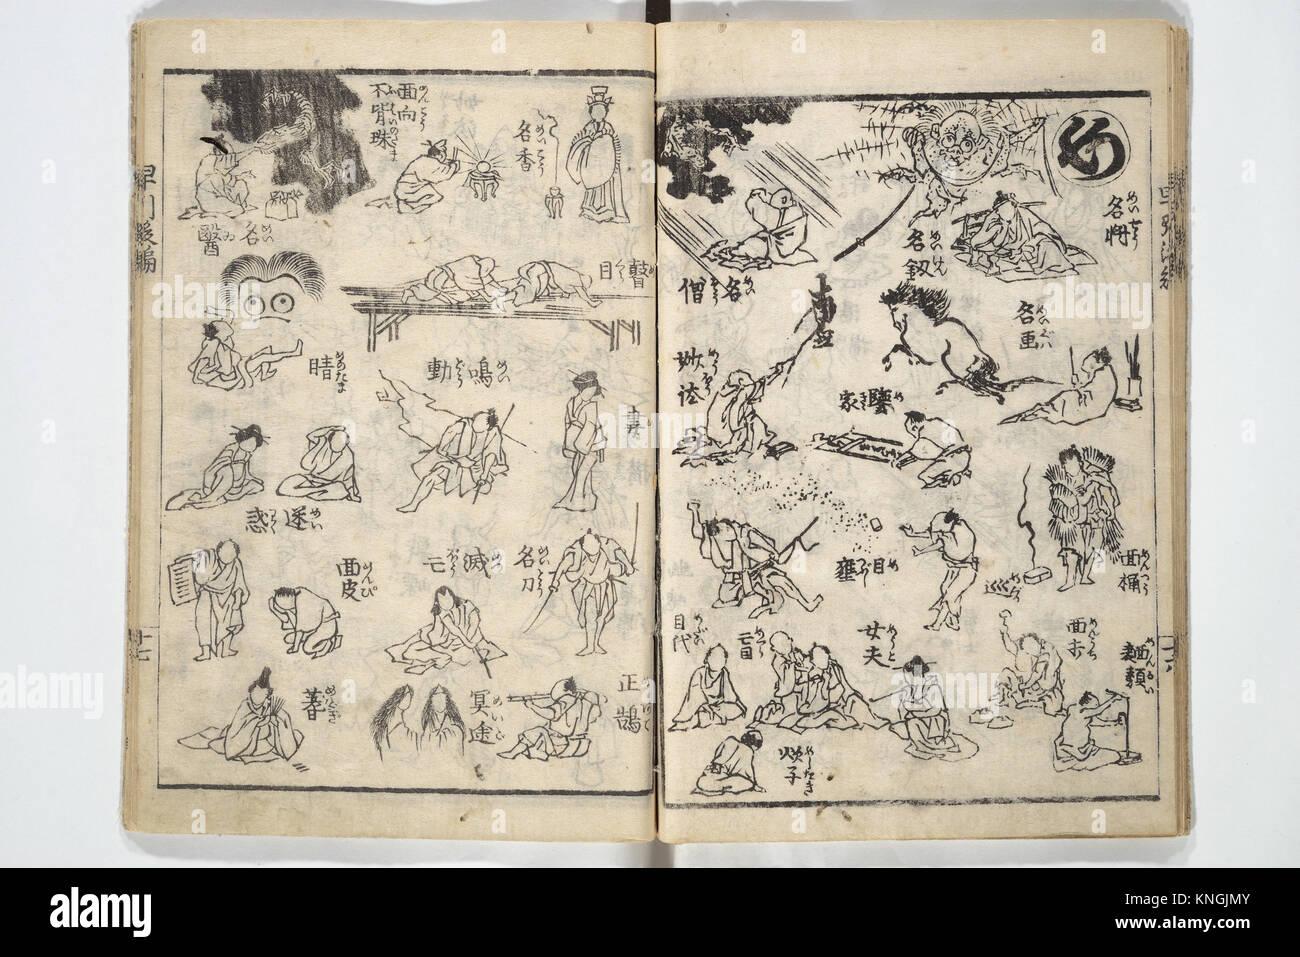 The Quick Pictorial Dictionary (Ehon hayabiki). Artist: Katsushika Hokusai (Japanese, Tokyo (Edo) 1760-1849 Tokyo - Stock Image